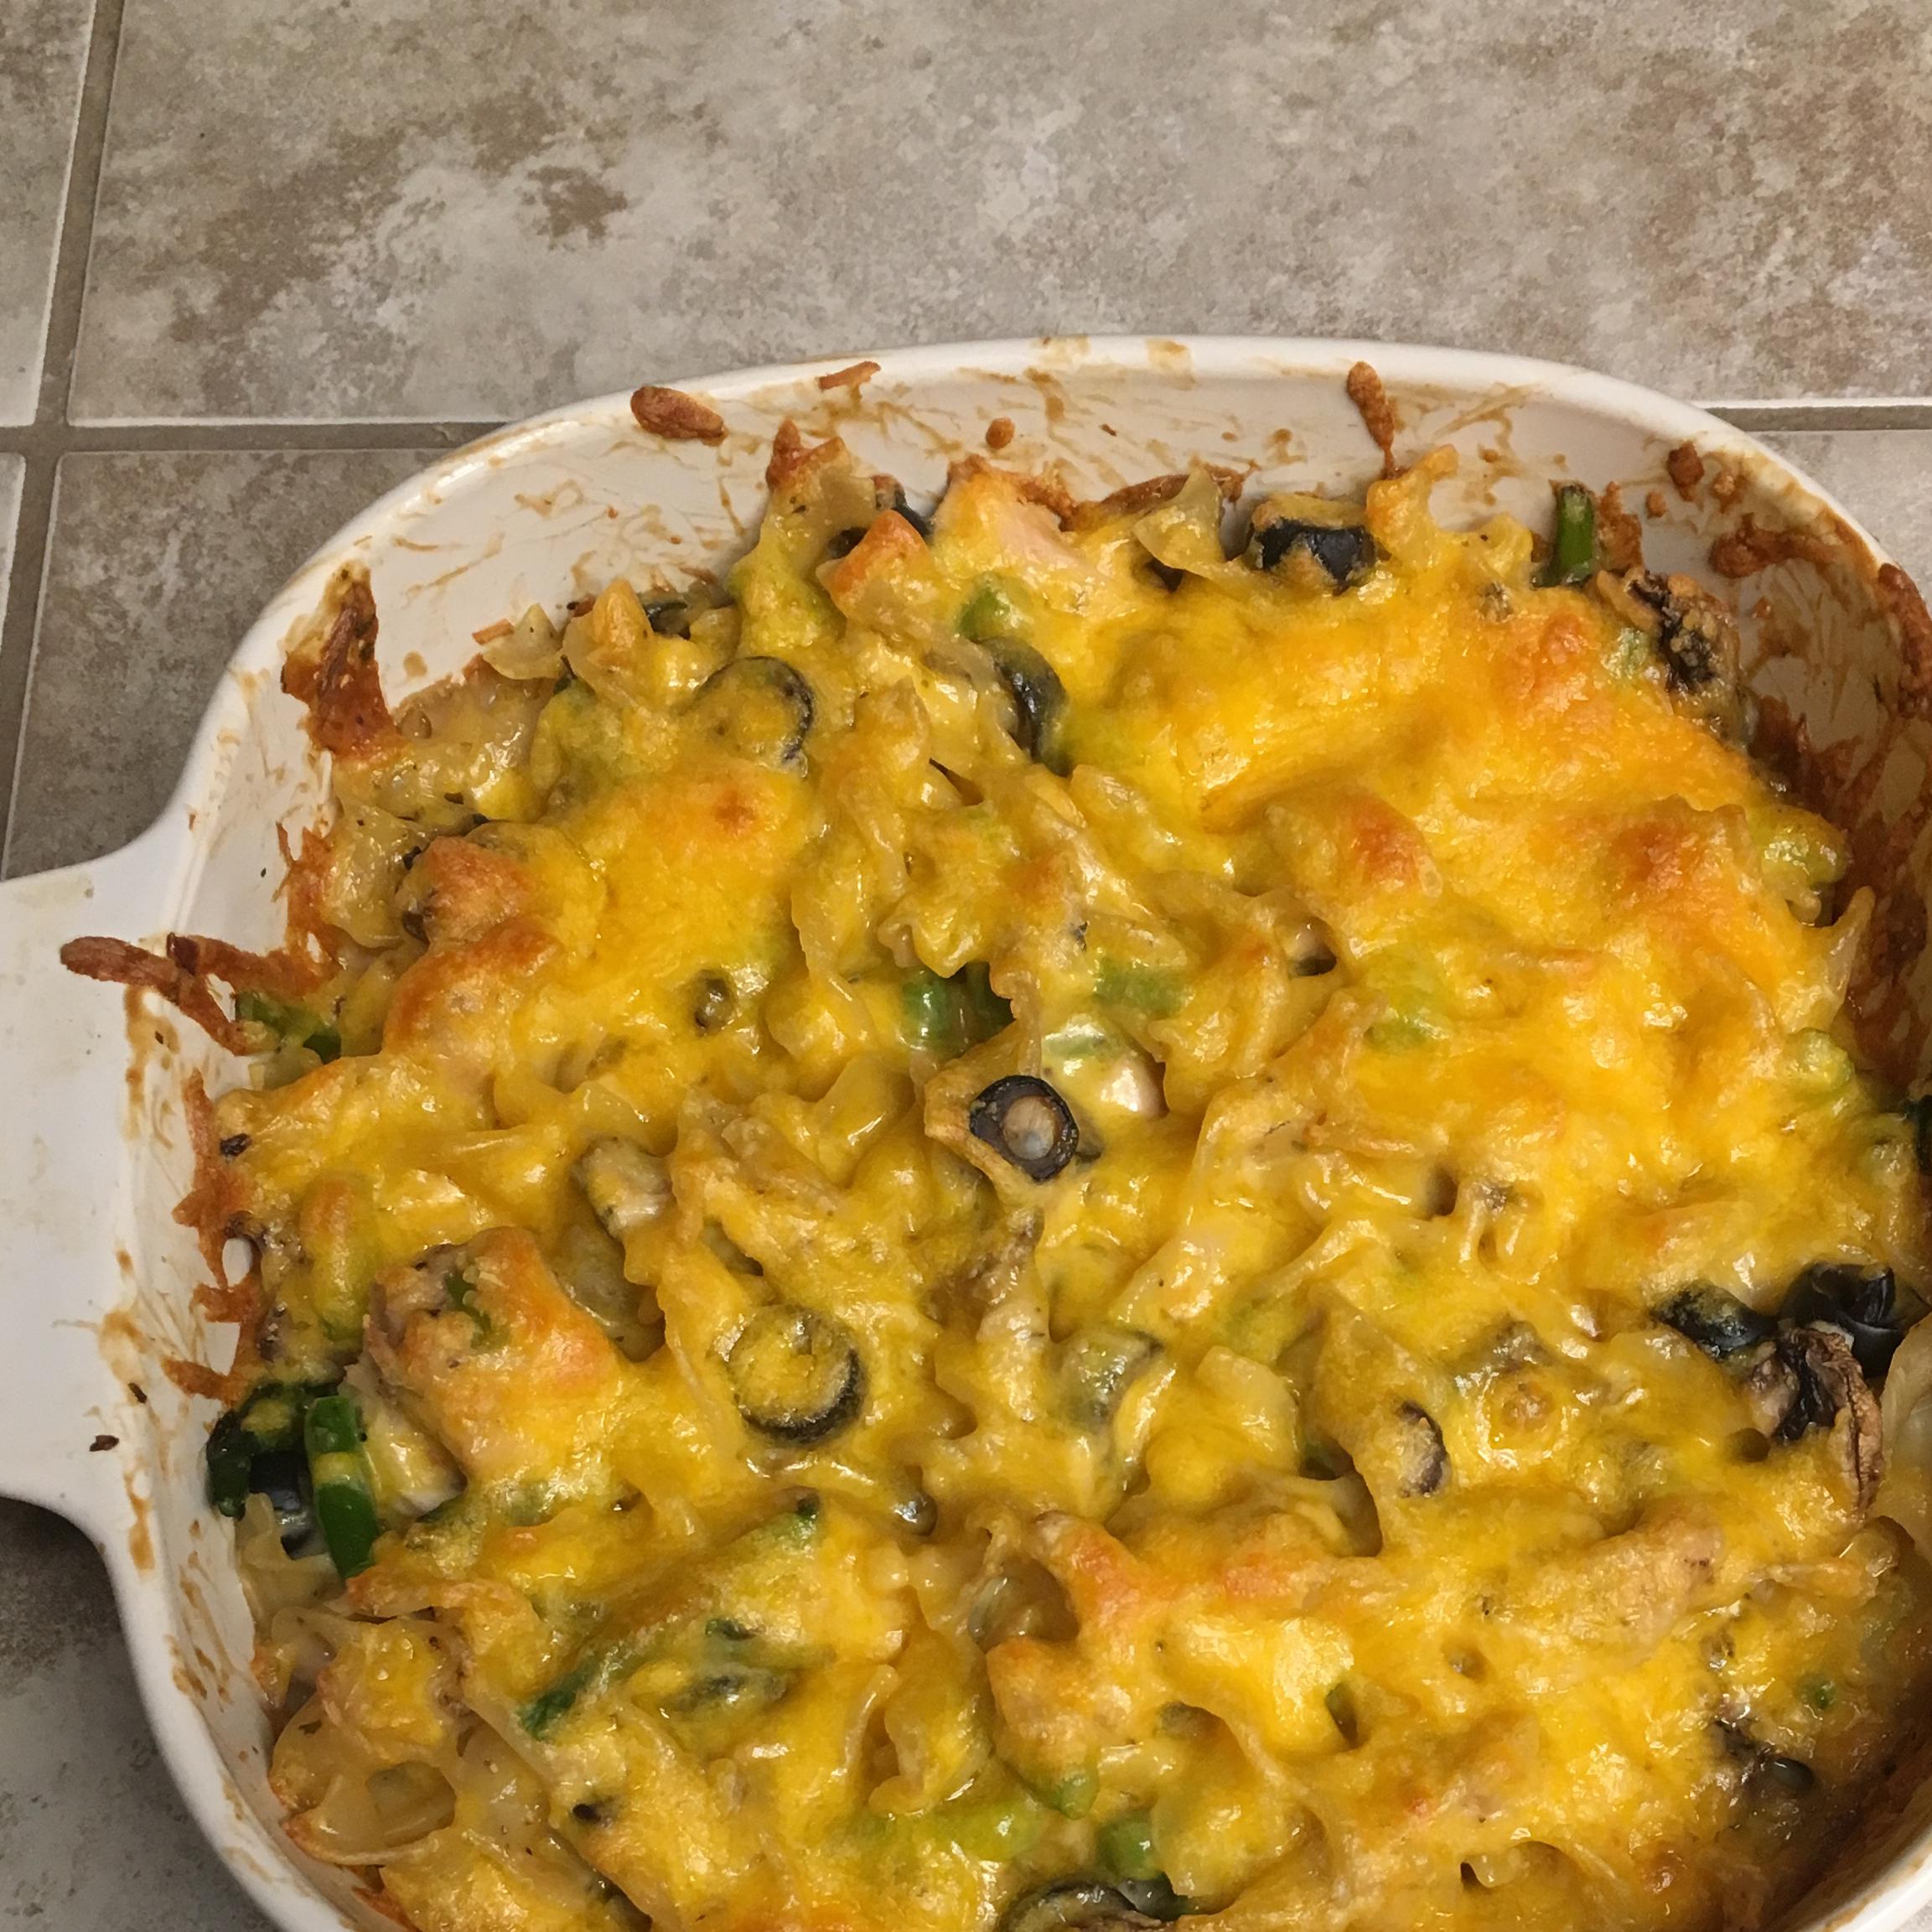 Tuna Noodle Asparagus Casserole Fishwhsiperer